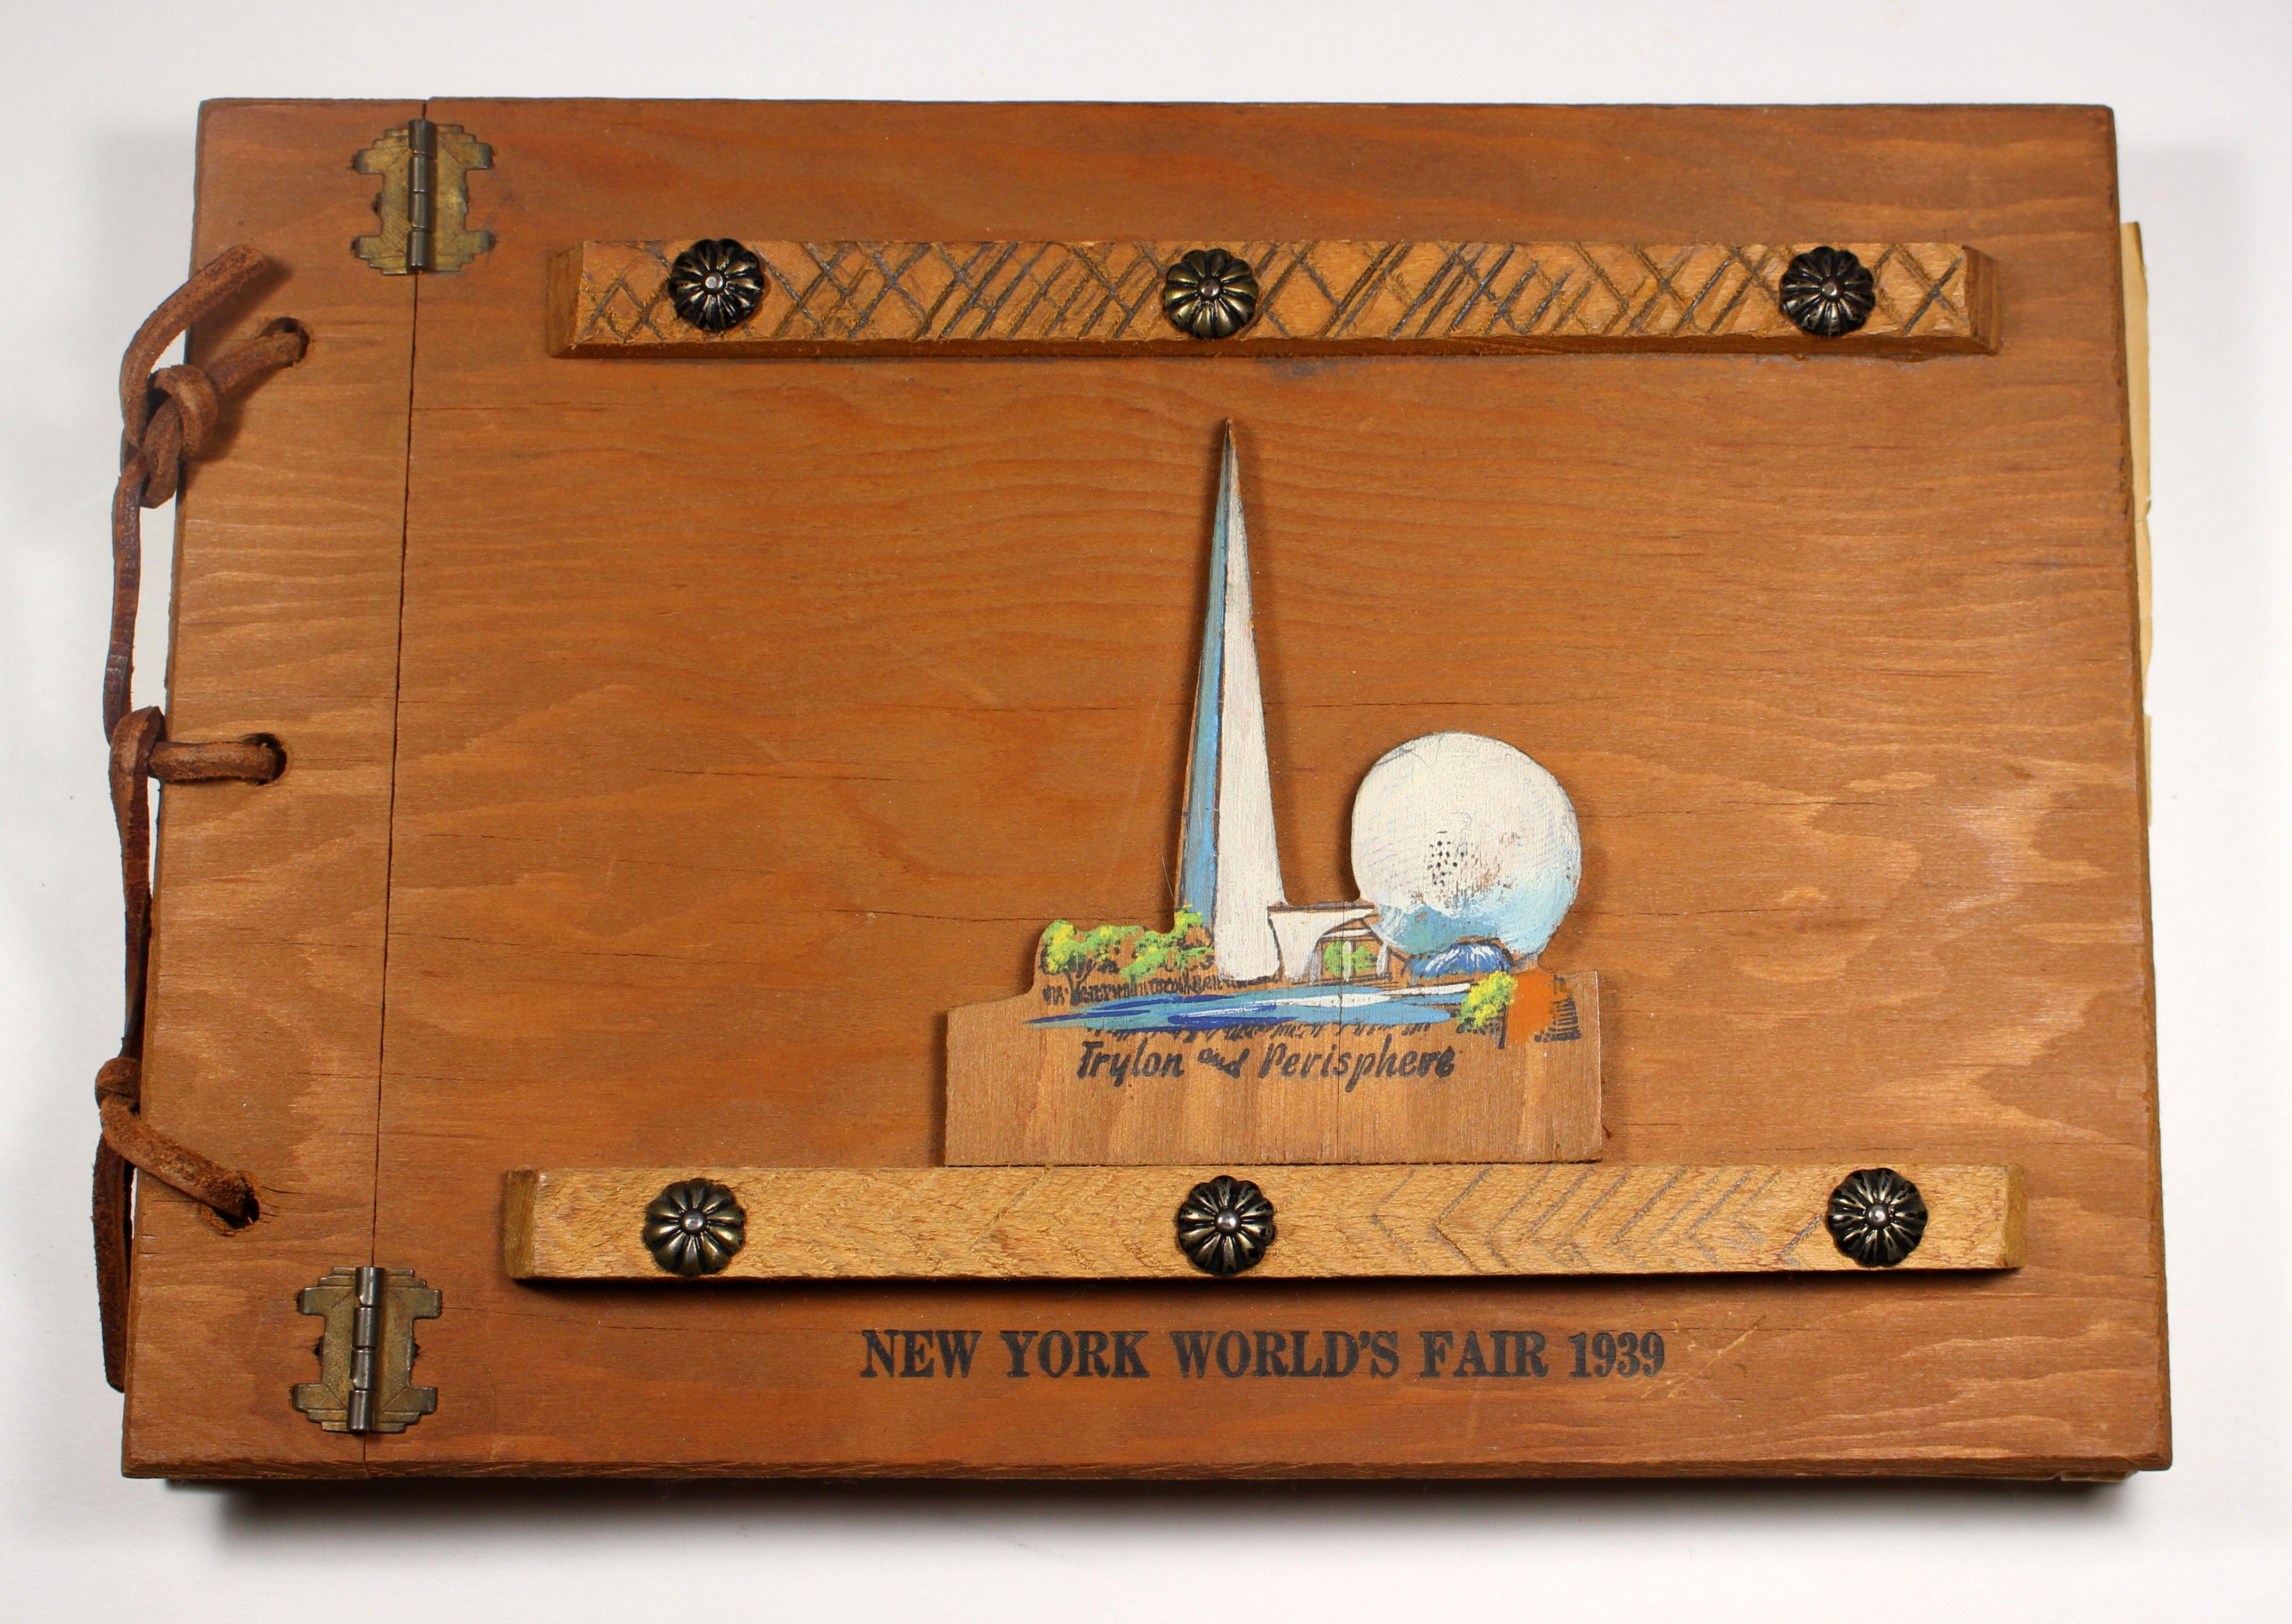 1939 New York Worlds Fair Wooden Scrapbook Vintage Souvenirs